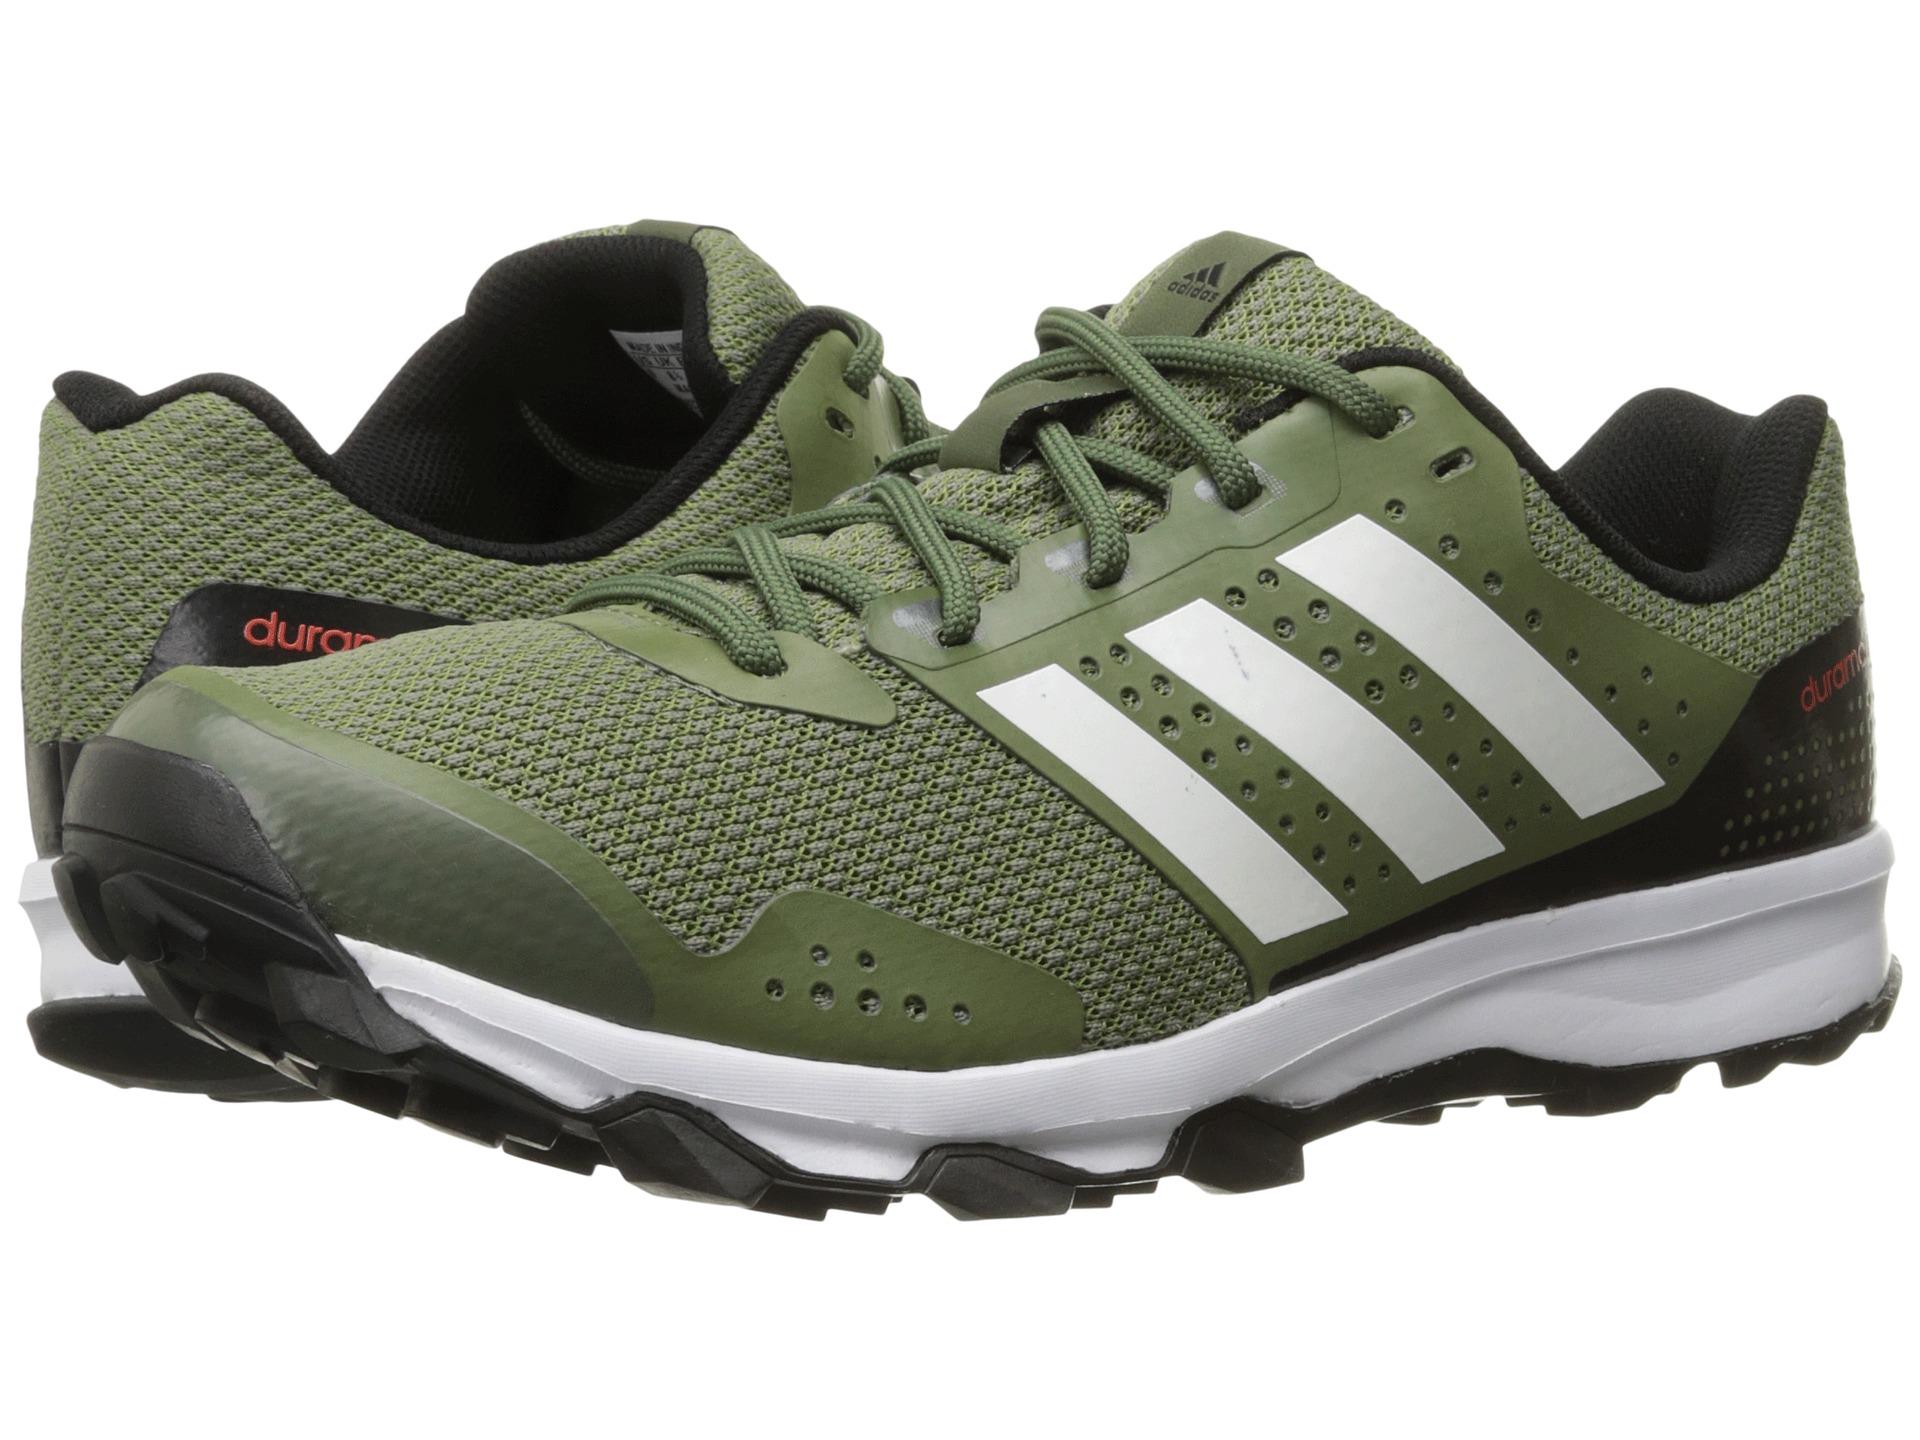 Adidas Duramo 7 Trail